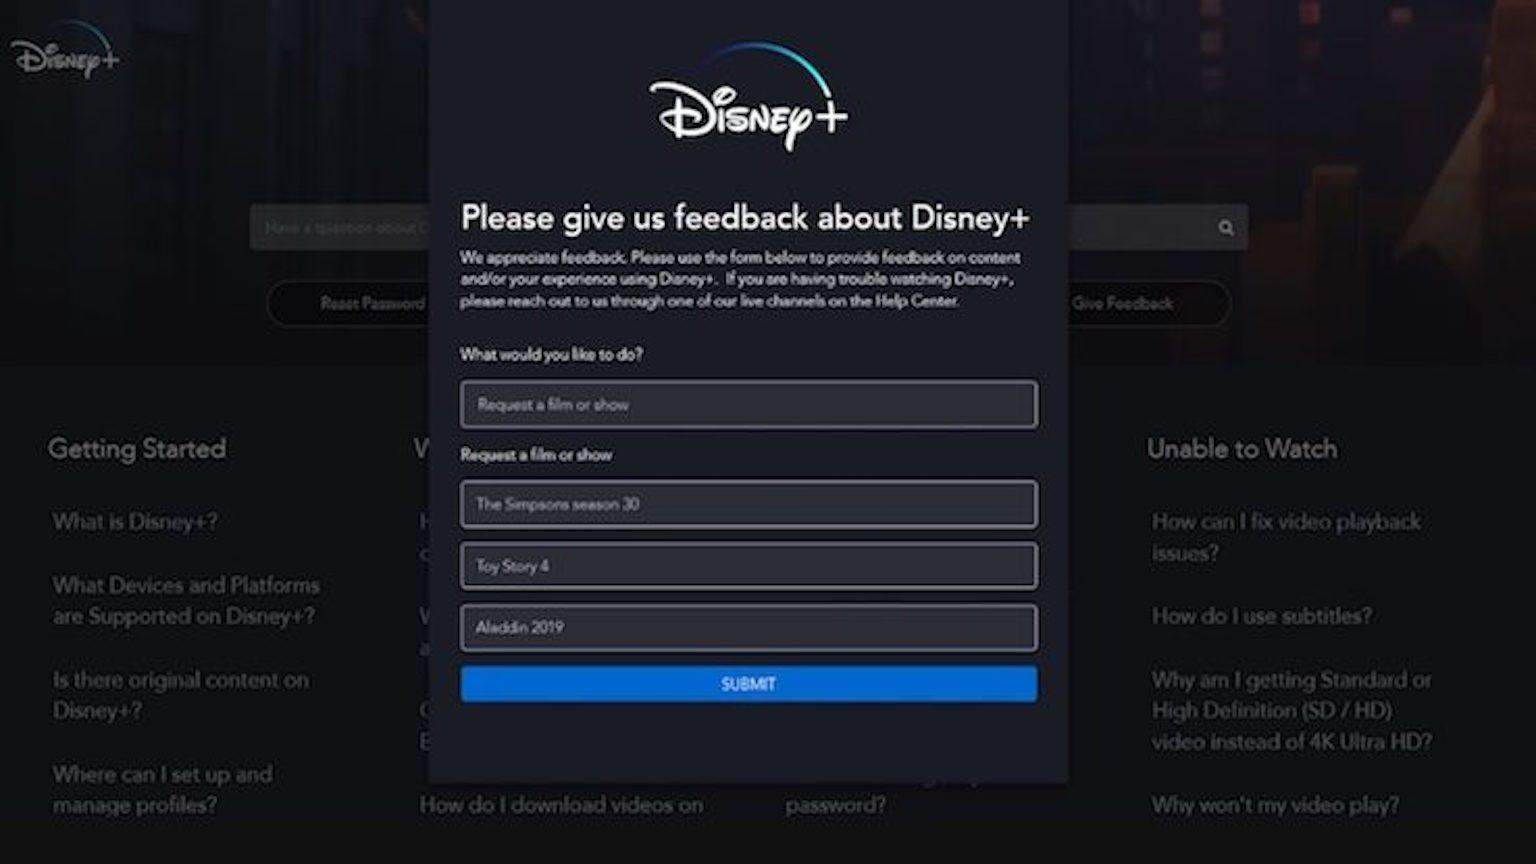 Disney + Movie Show Requests